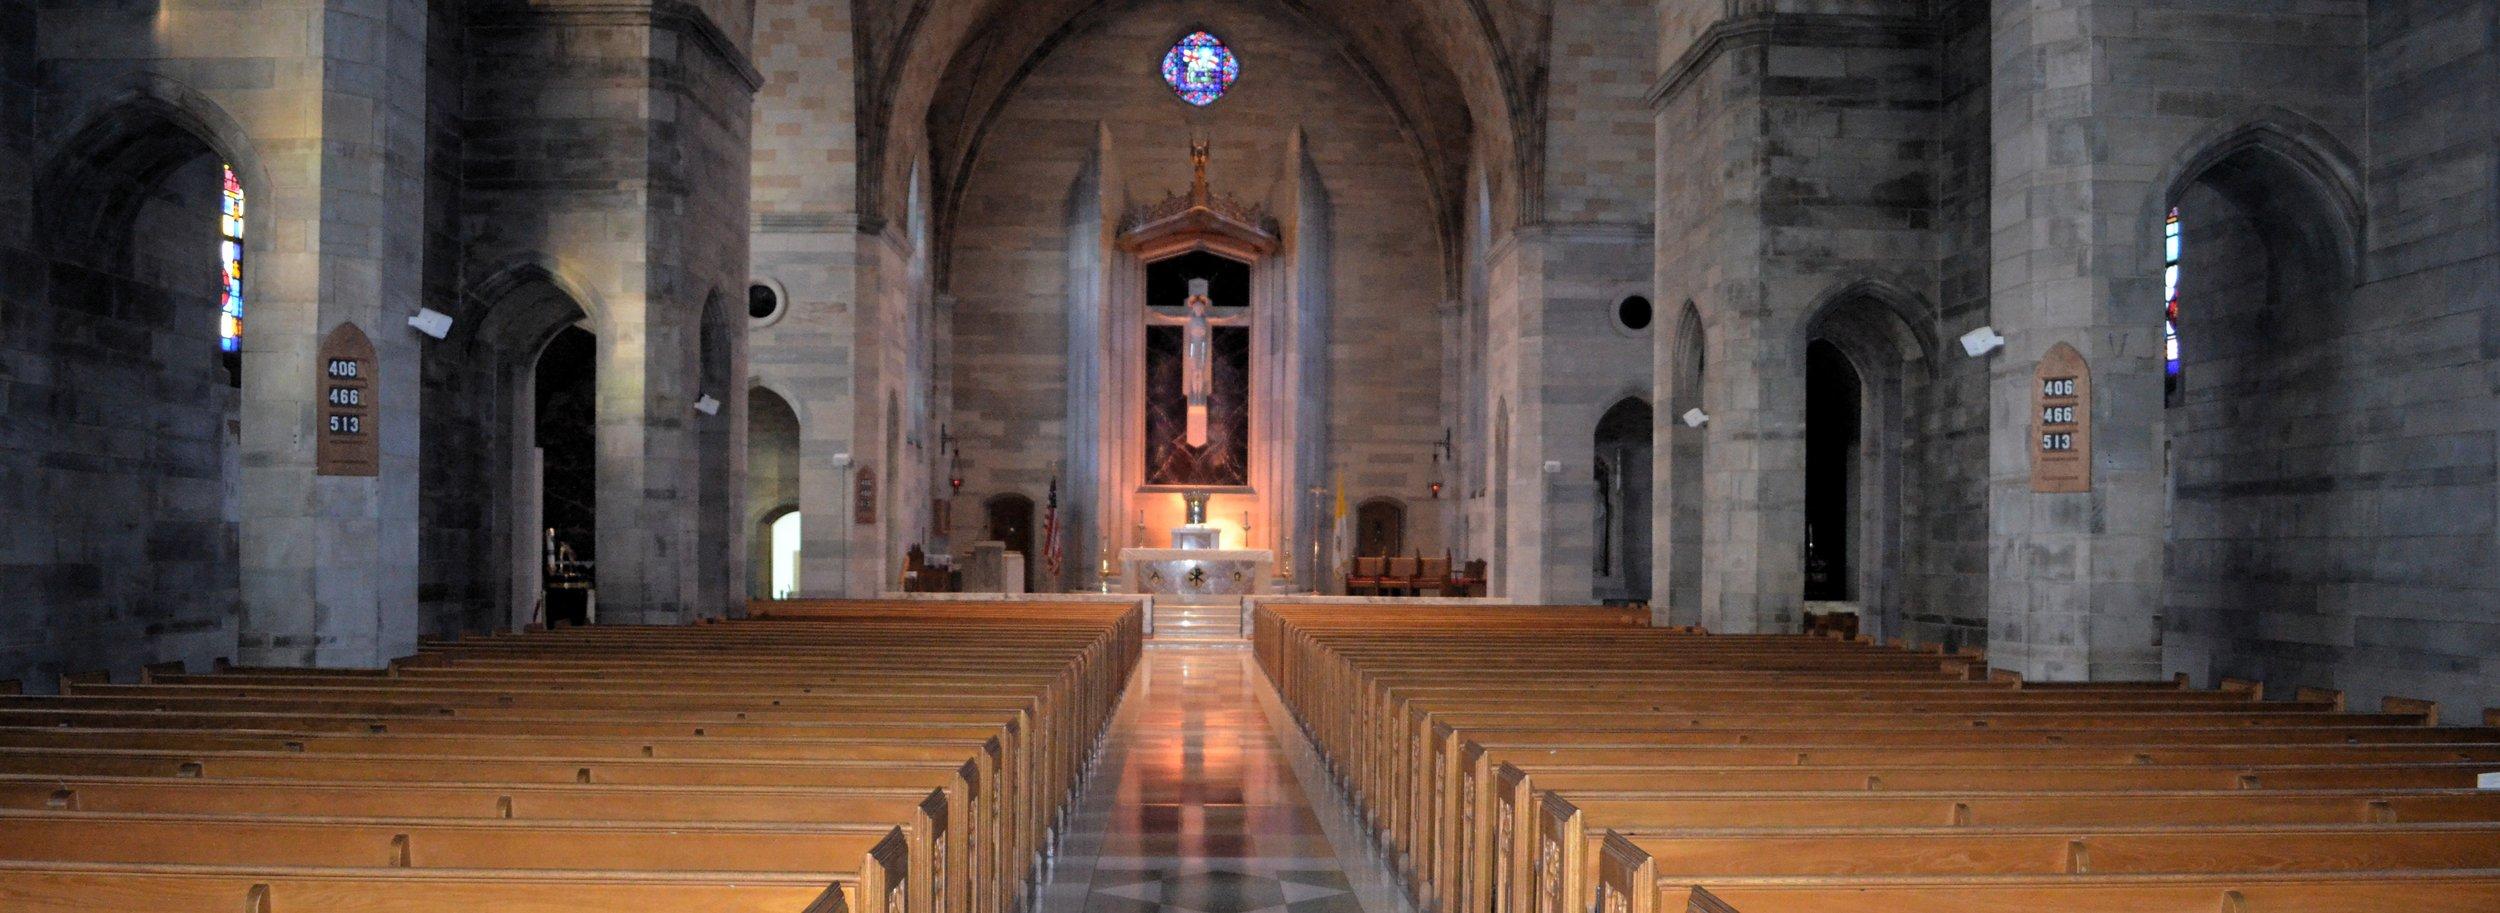 St. Ann Interior.jpg